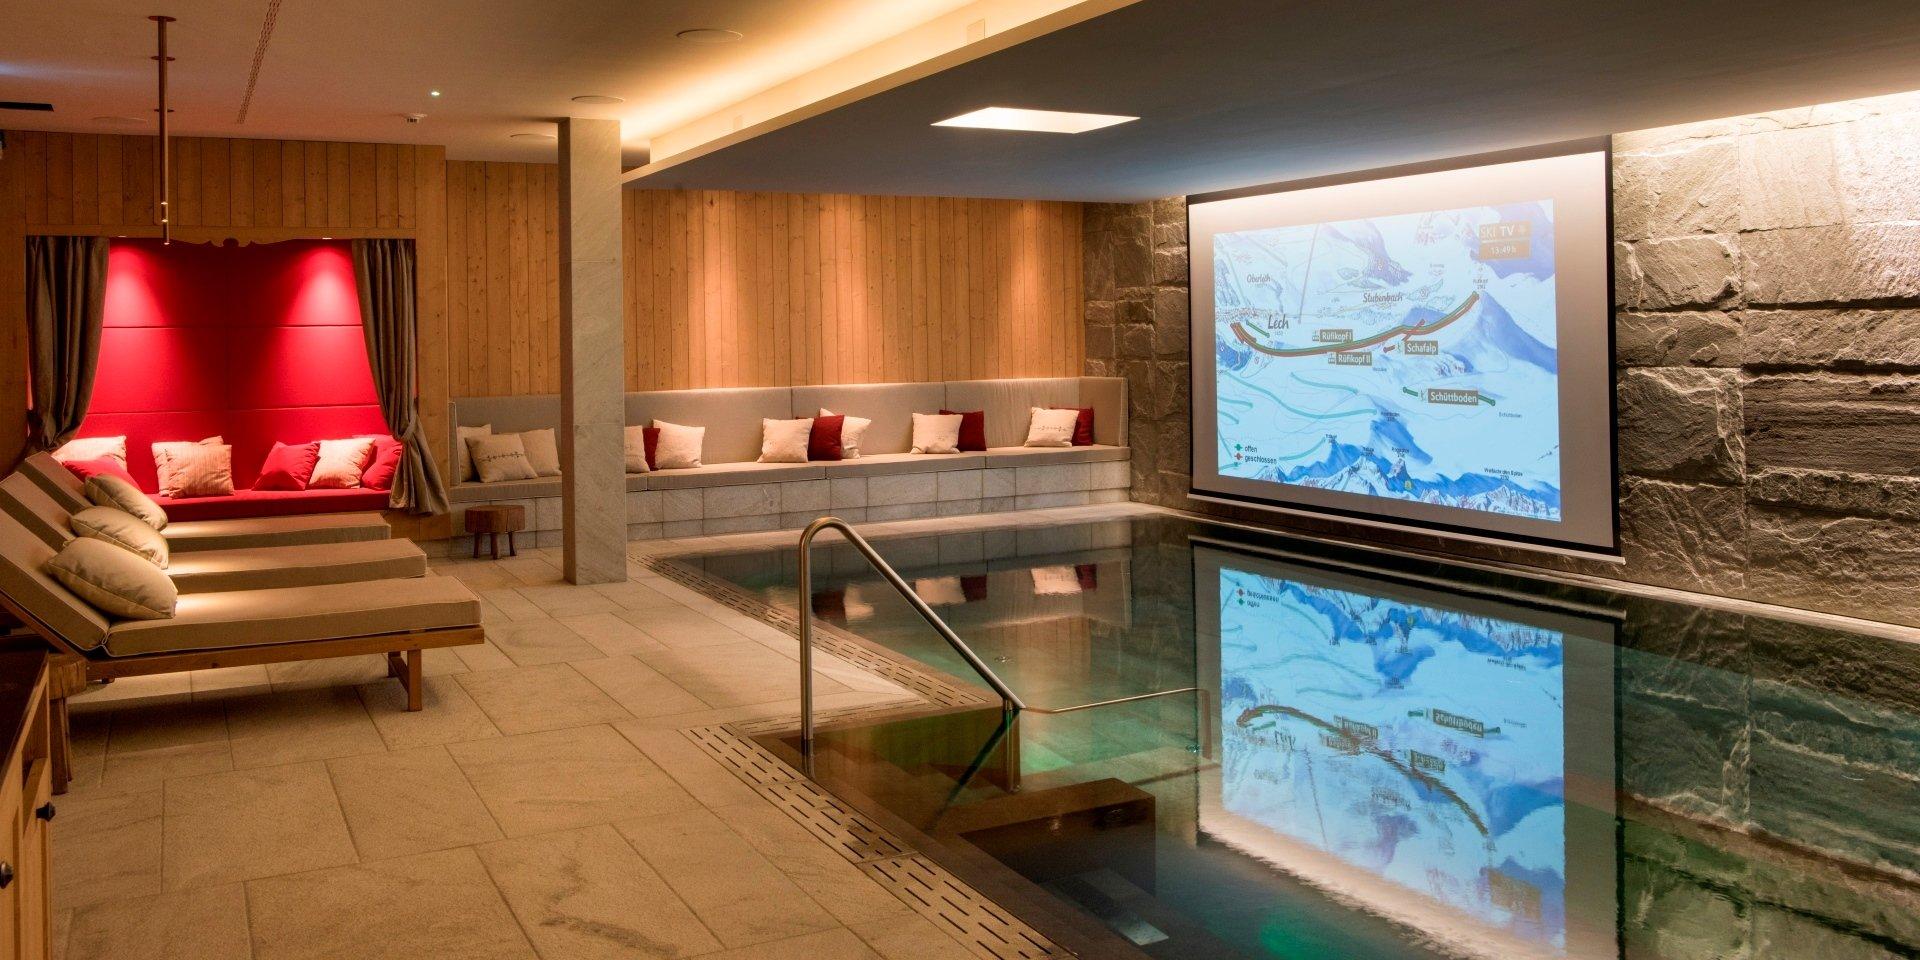 Steuler Pool Linings Chalet Mimi Oberlech Relax Area